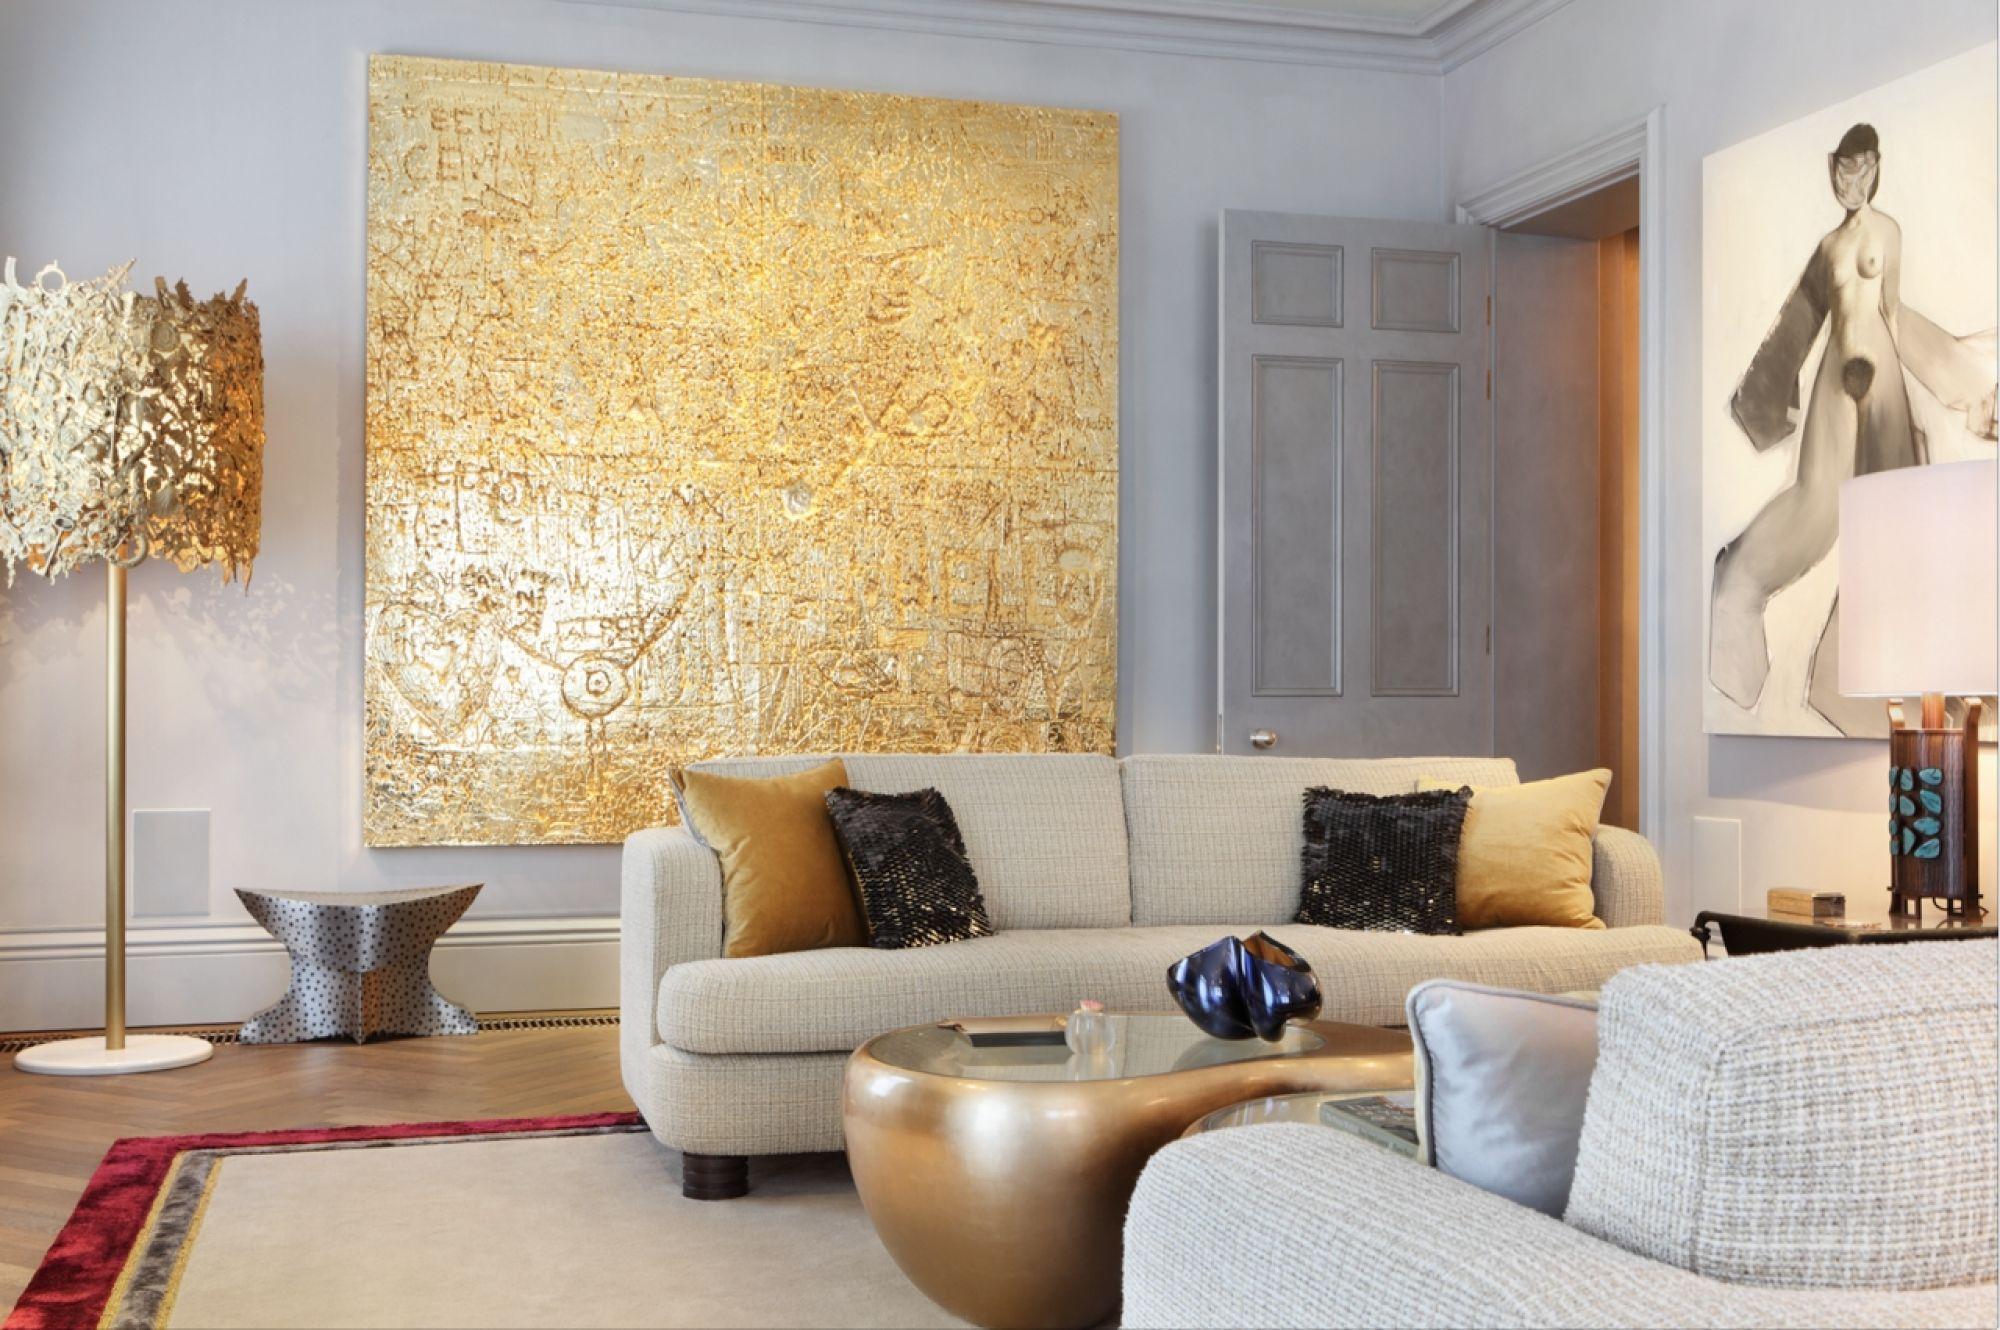 Interior Designer Francis Sultana From Malta To Mayfair